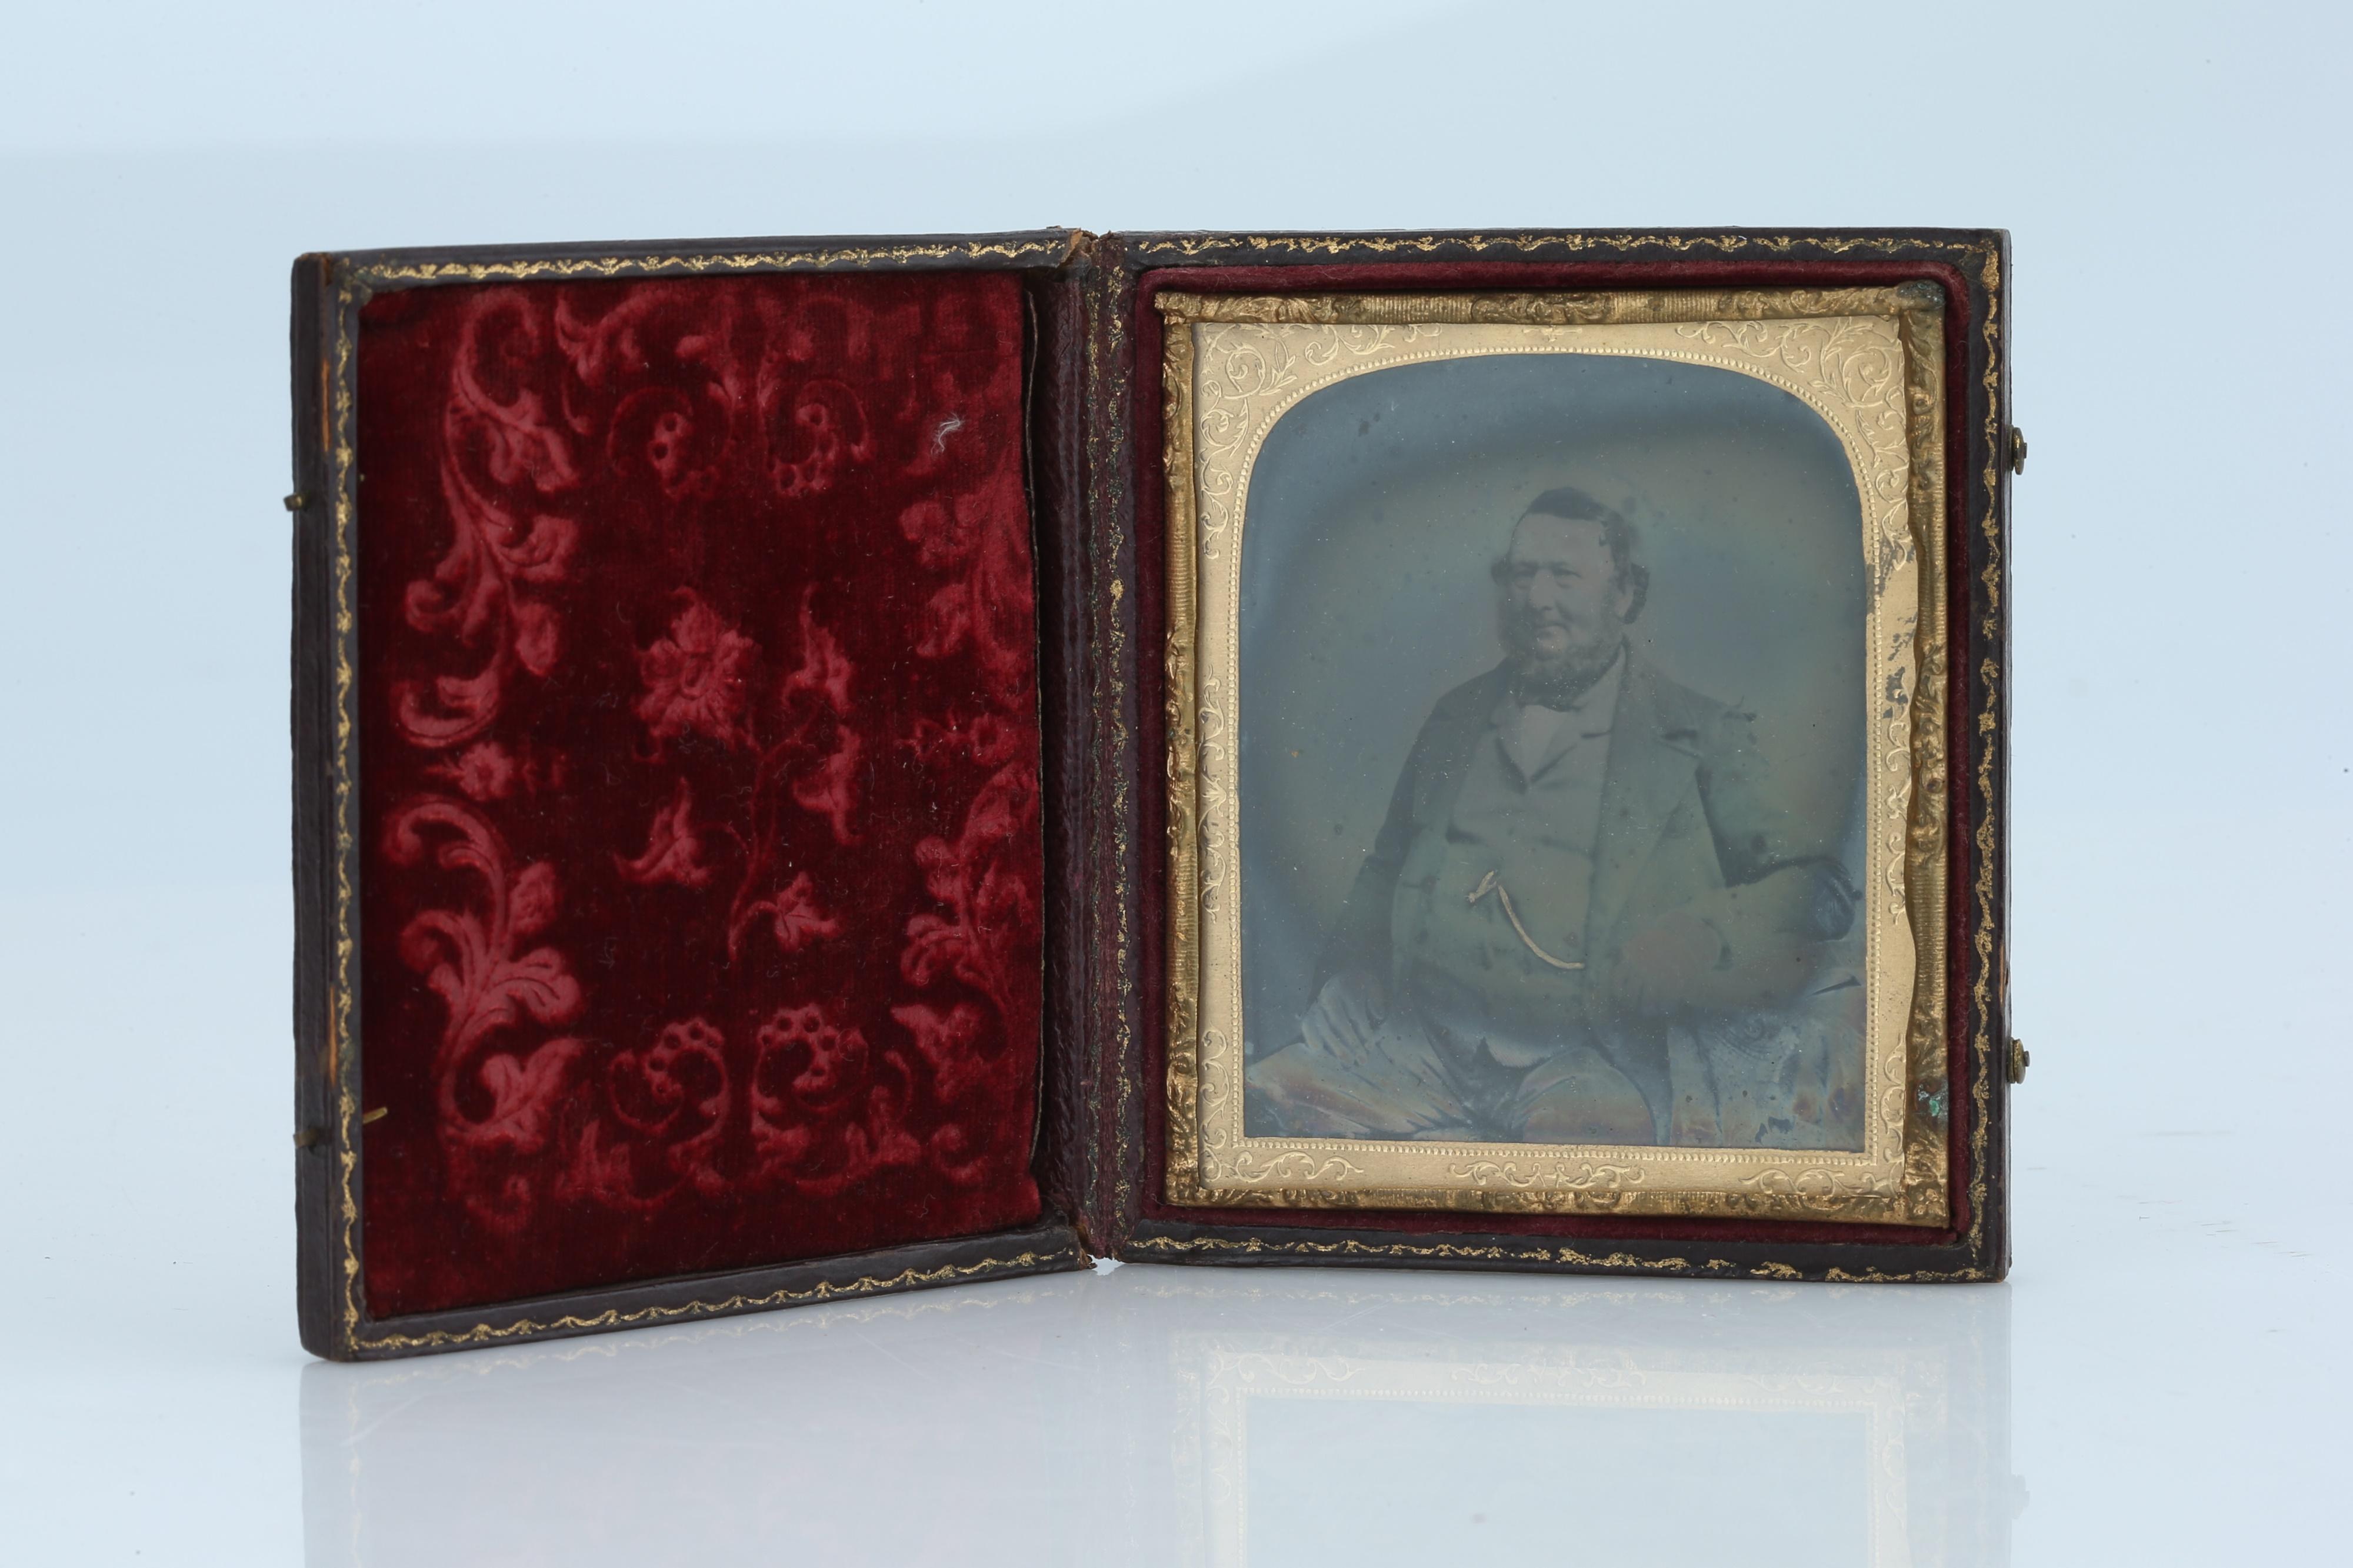 HIRAM CROMPTON BOOTH (1825-1890), An Opalotype Photograph, - Image 6 of 7